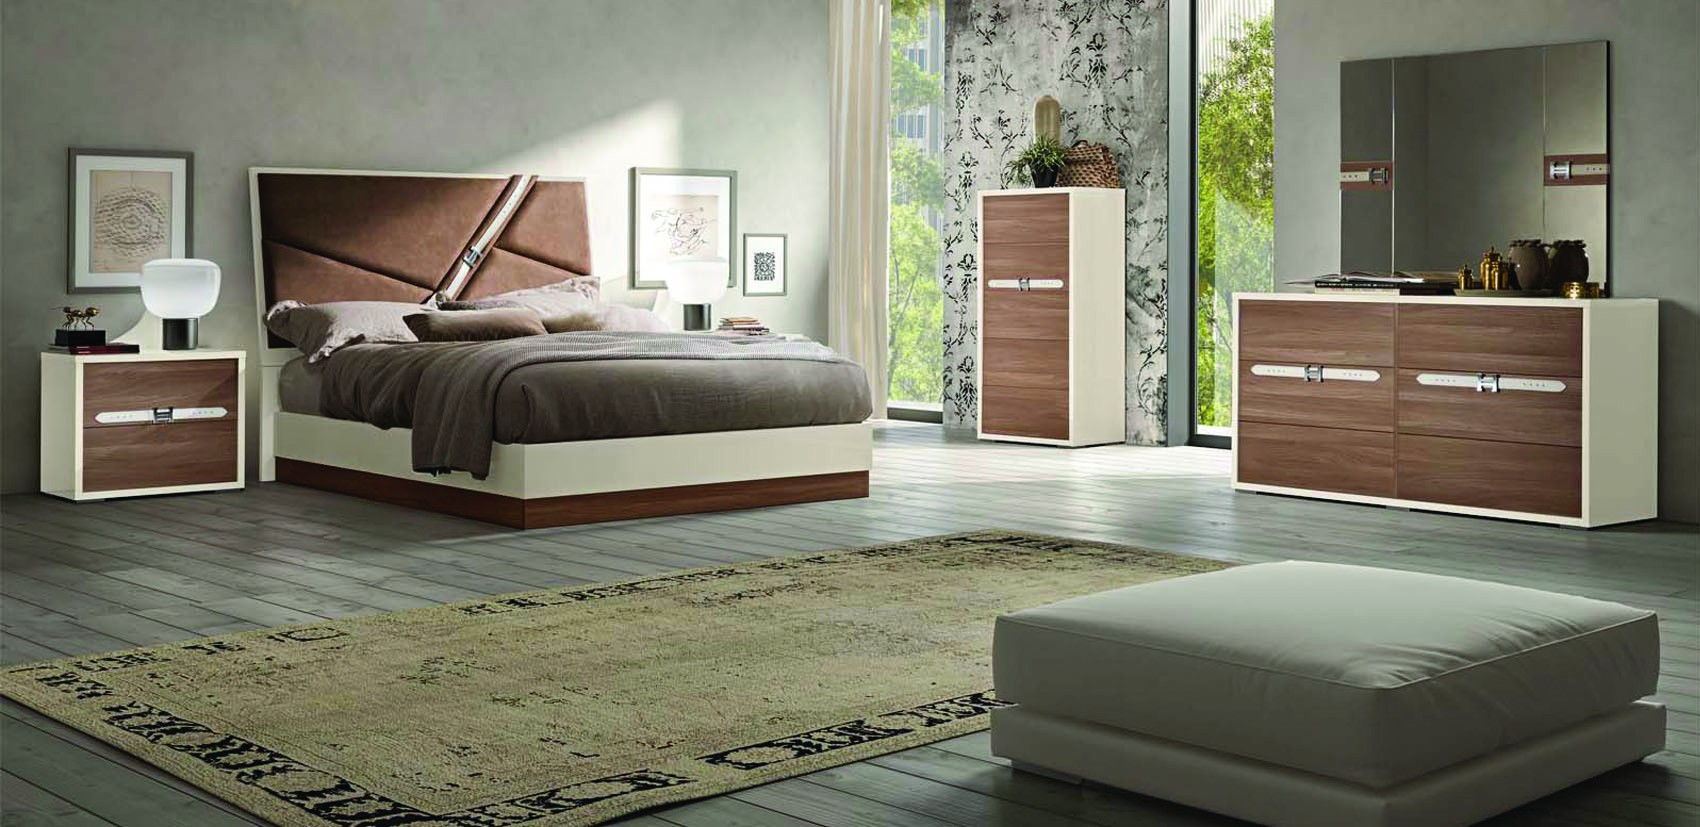 Italian Bedroom Furniture Living Rooms Dining Room